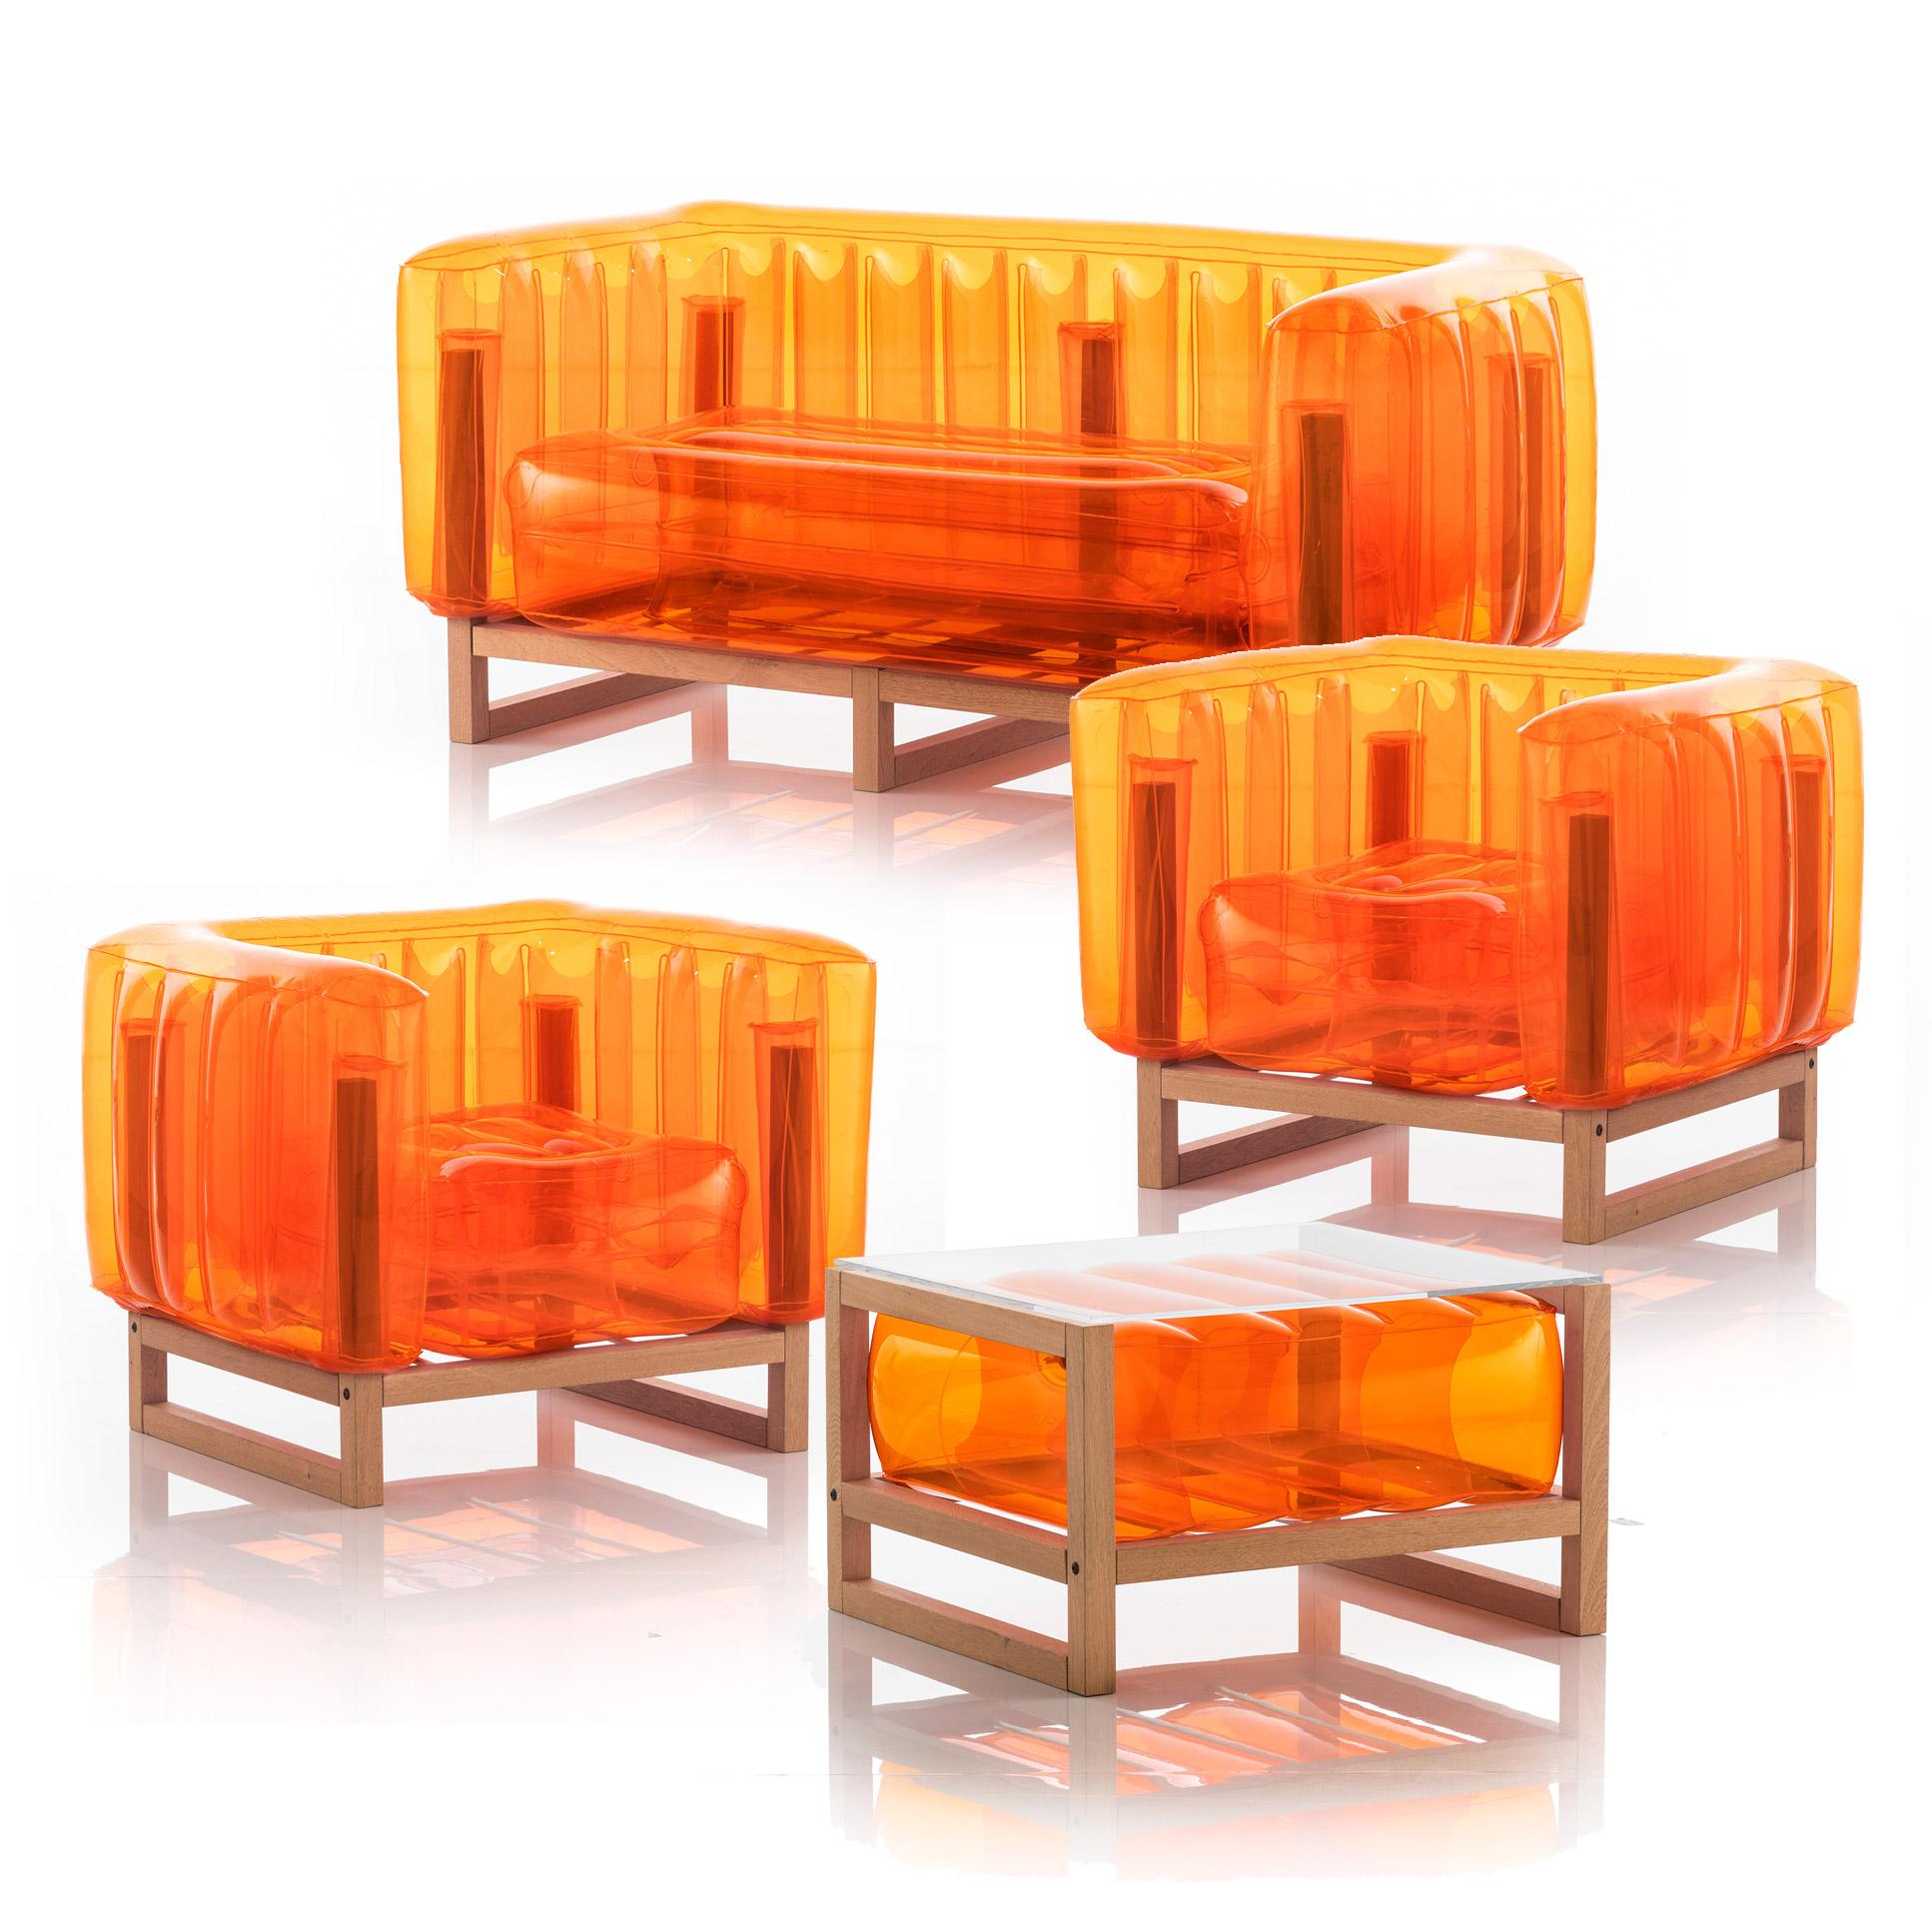 Salon de jardin design 1 canapé, 2 fauteuils et table basse orange